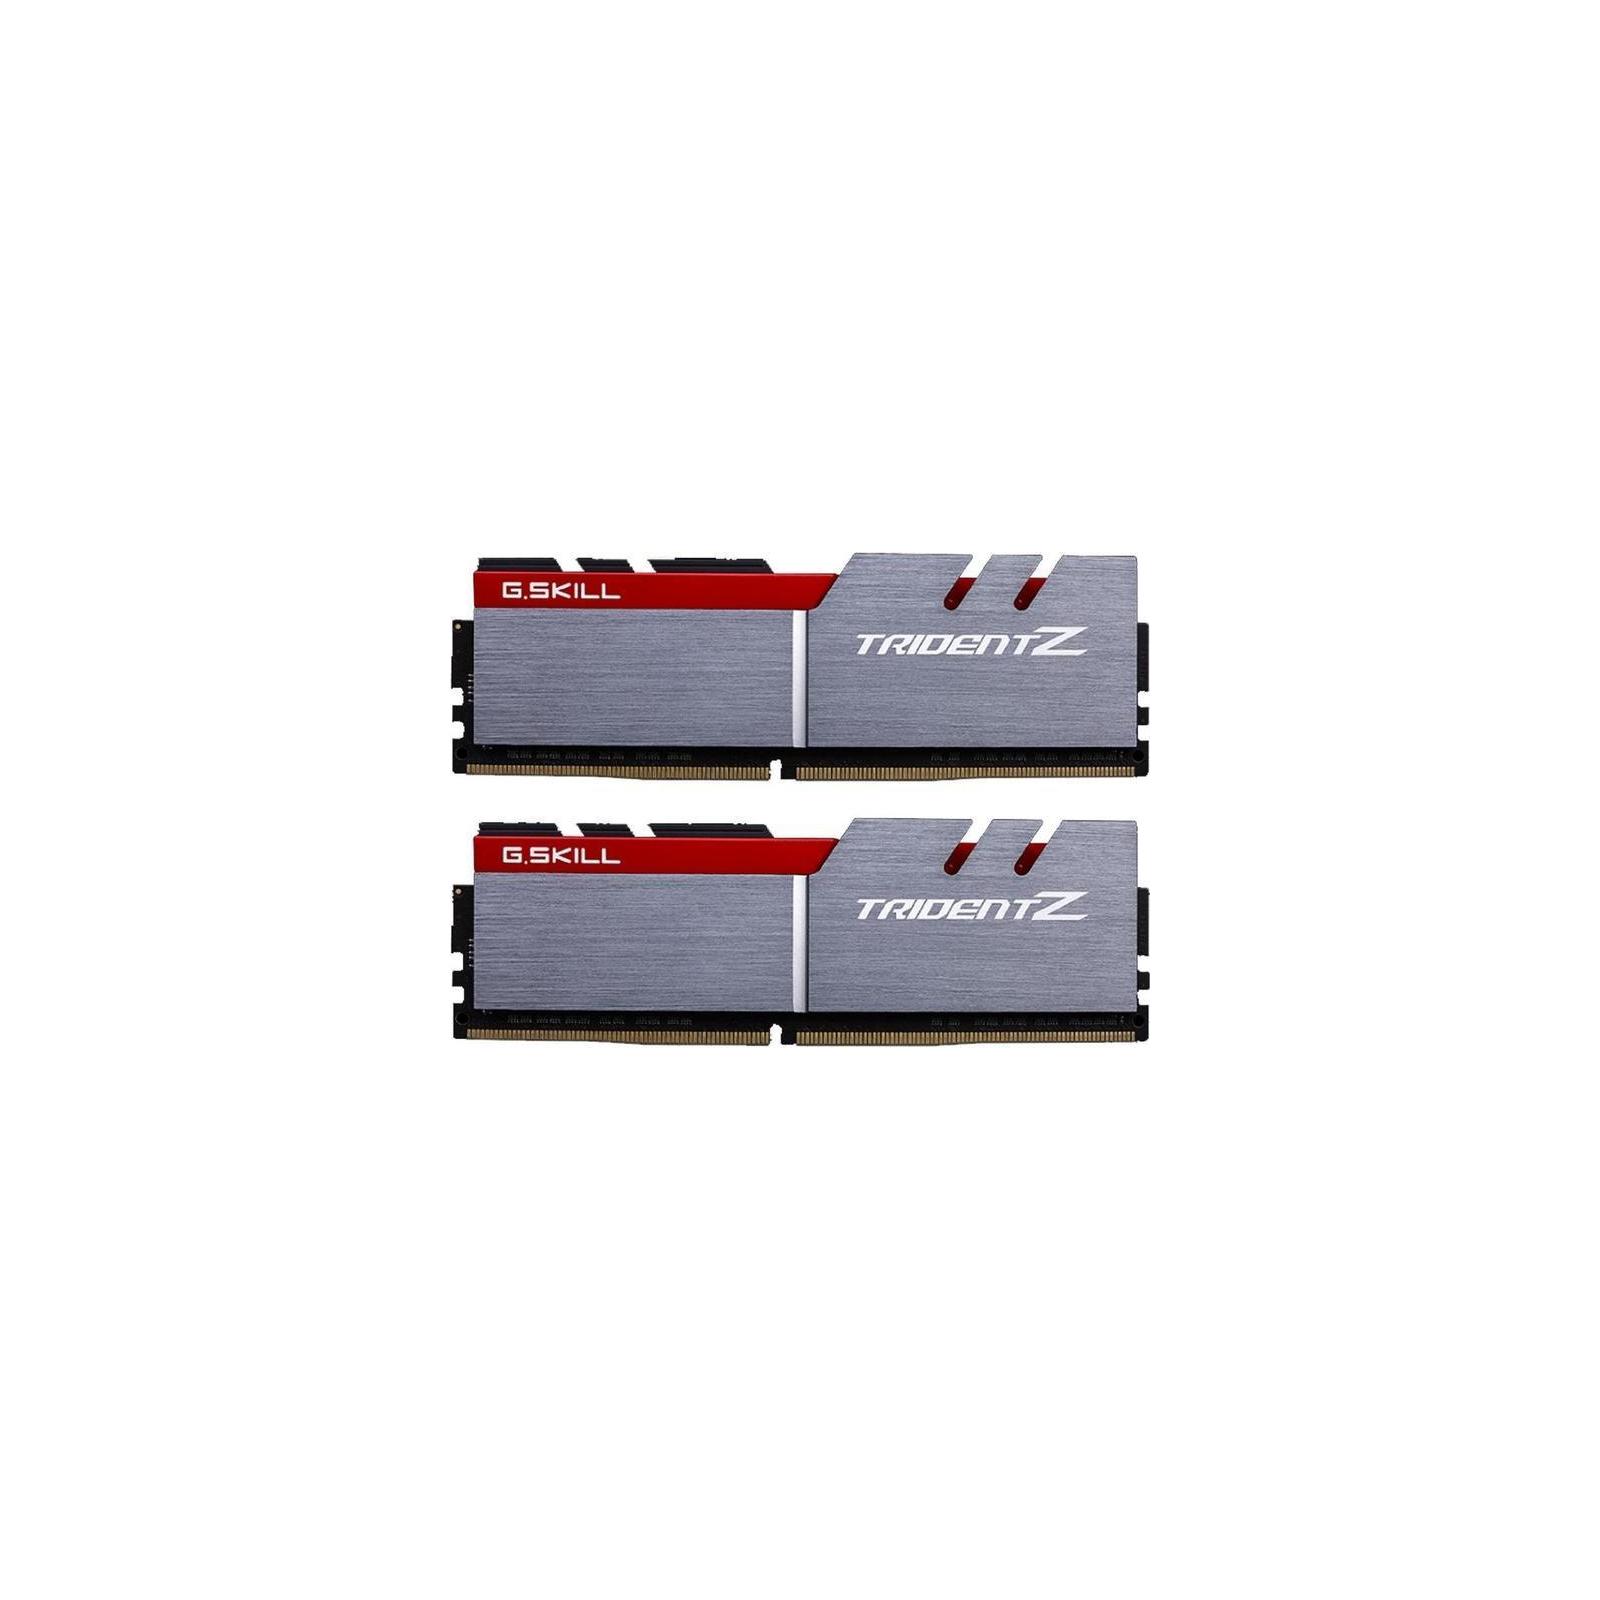 Модуль памяти для компьютера DDR4 16GB (2x8GB) 3600 MHz Trident Z Silver H G.Skill (F4-3600C17D-16GTZ)